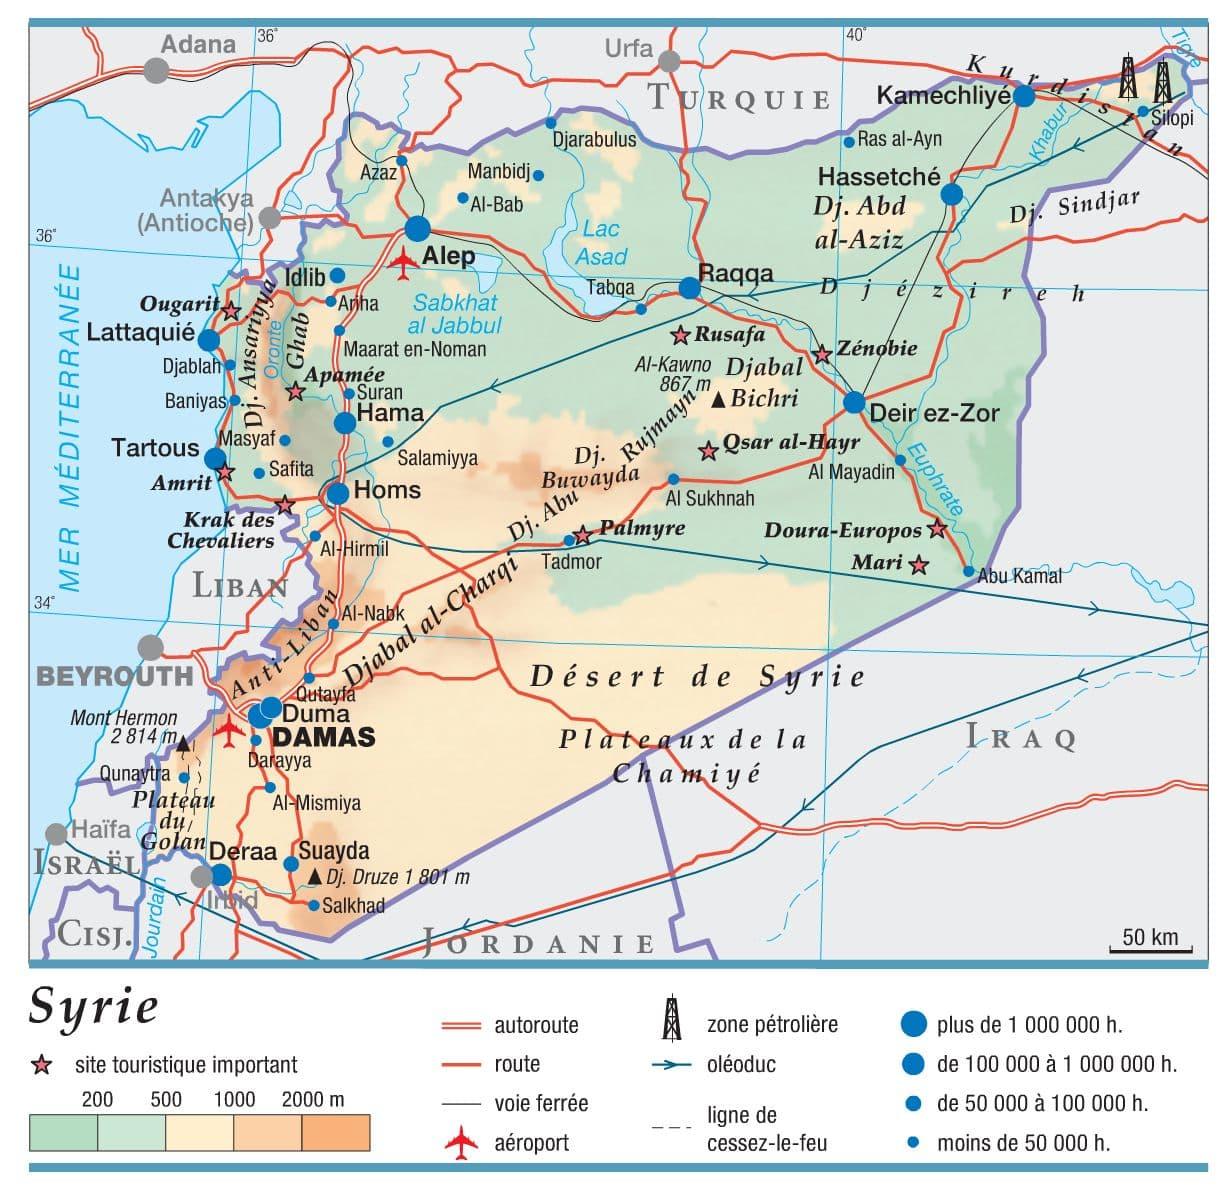 https://i2.wp.com/www.larousse.fr/encyclopedie/data/cartes/1306143-Syrie.HD.jpg